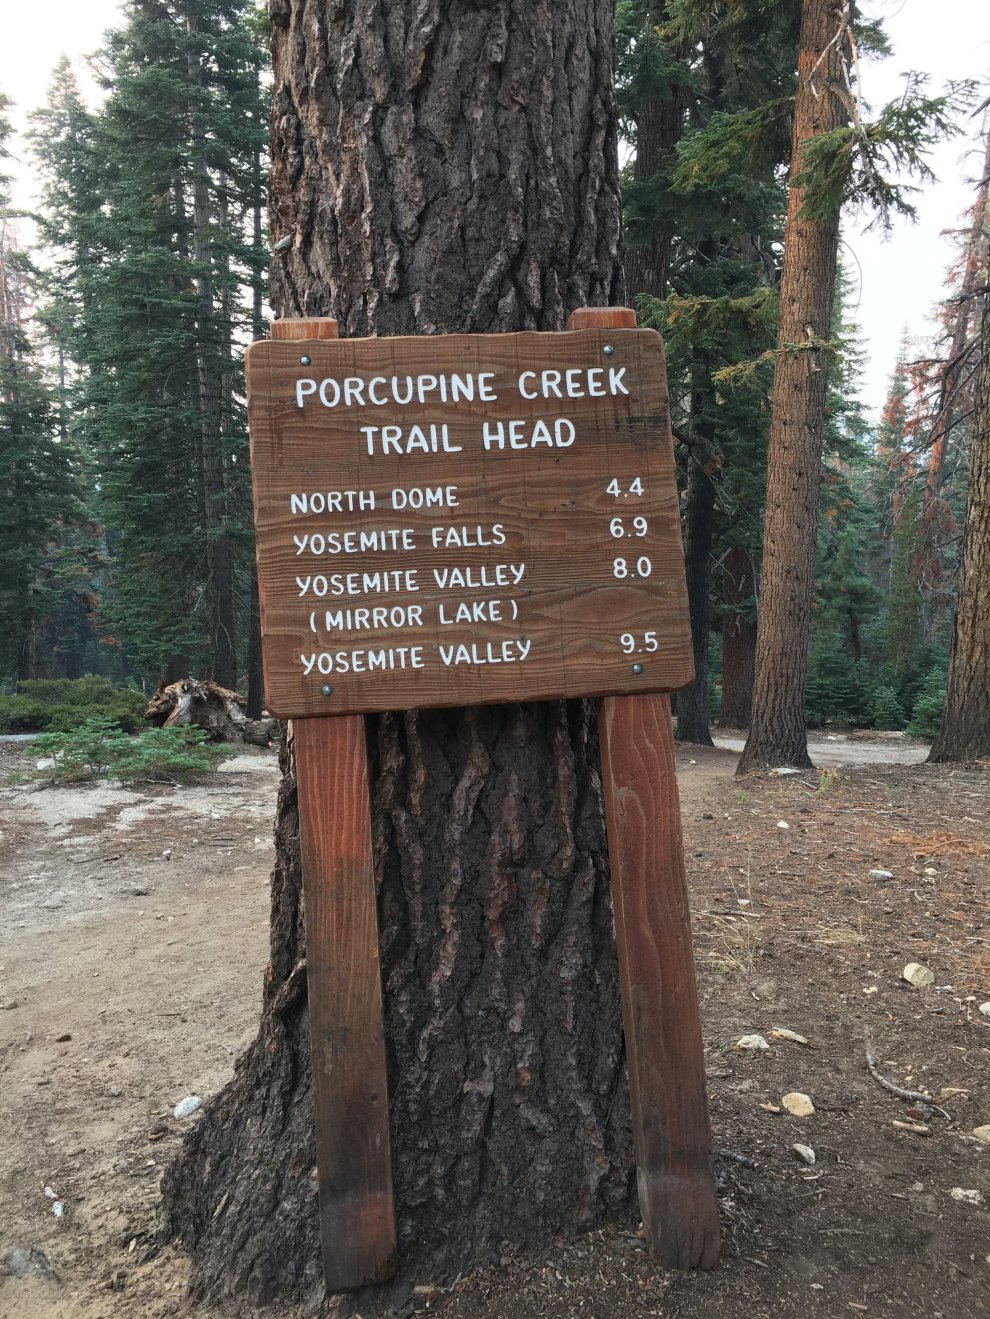 Porcupine Creek Trail Head